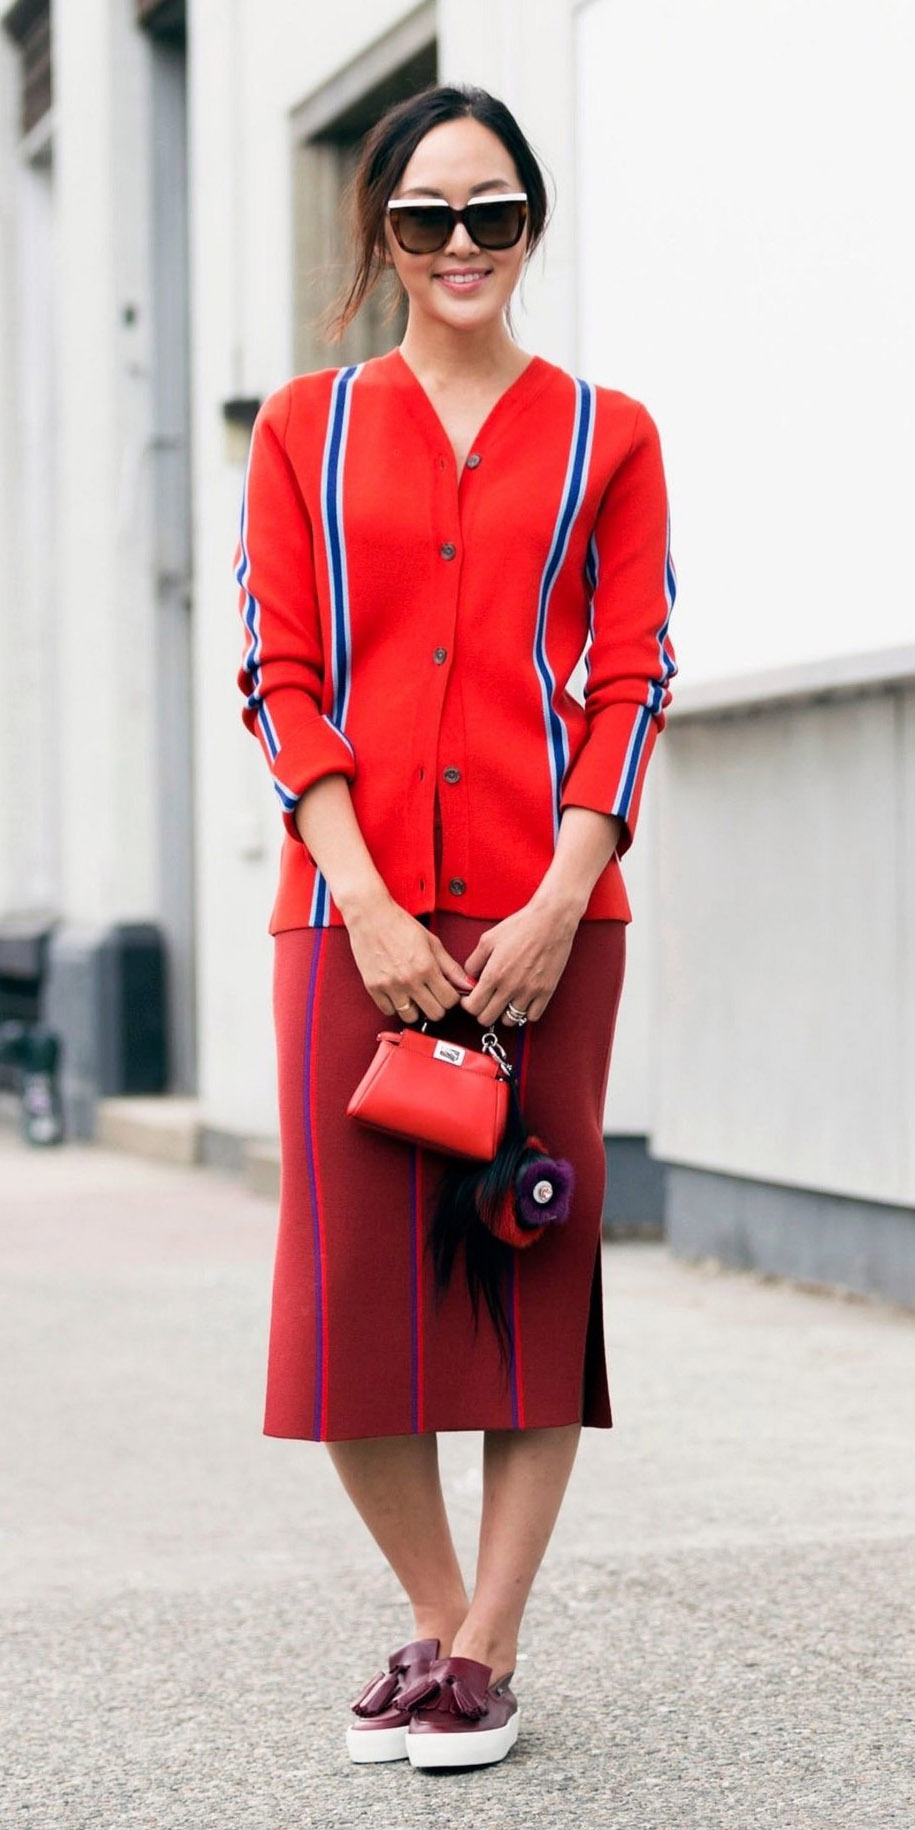 red-midi-skirt-red-cardigan-brun-pony-sun-red-bag-burgundy-shoe-flats-fall-winter-weekend.jpg